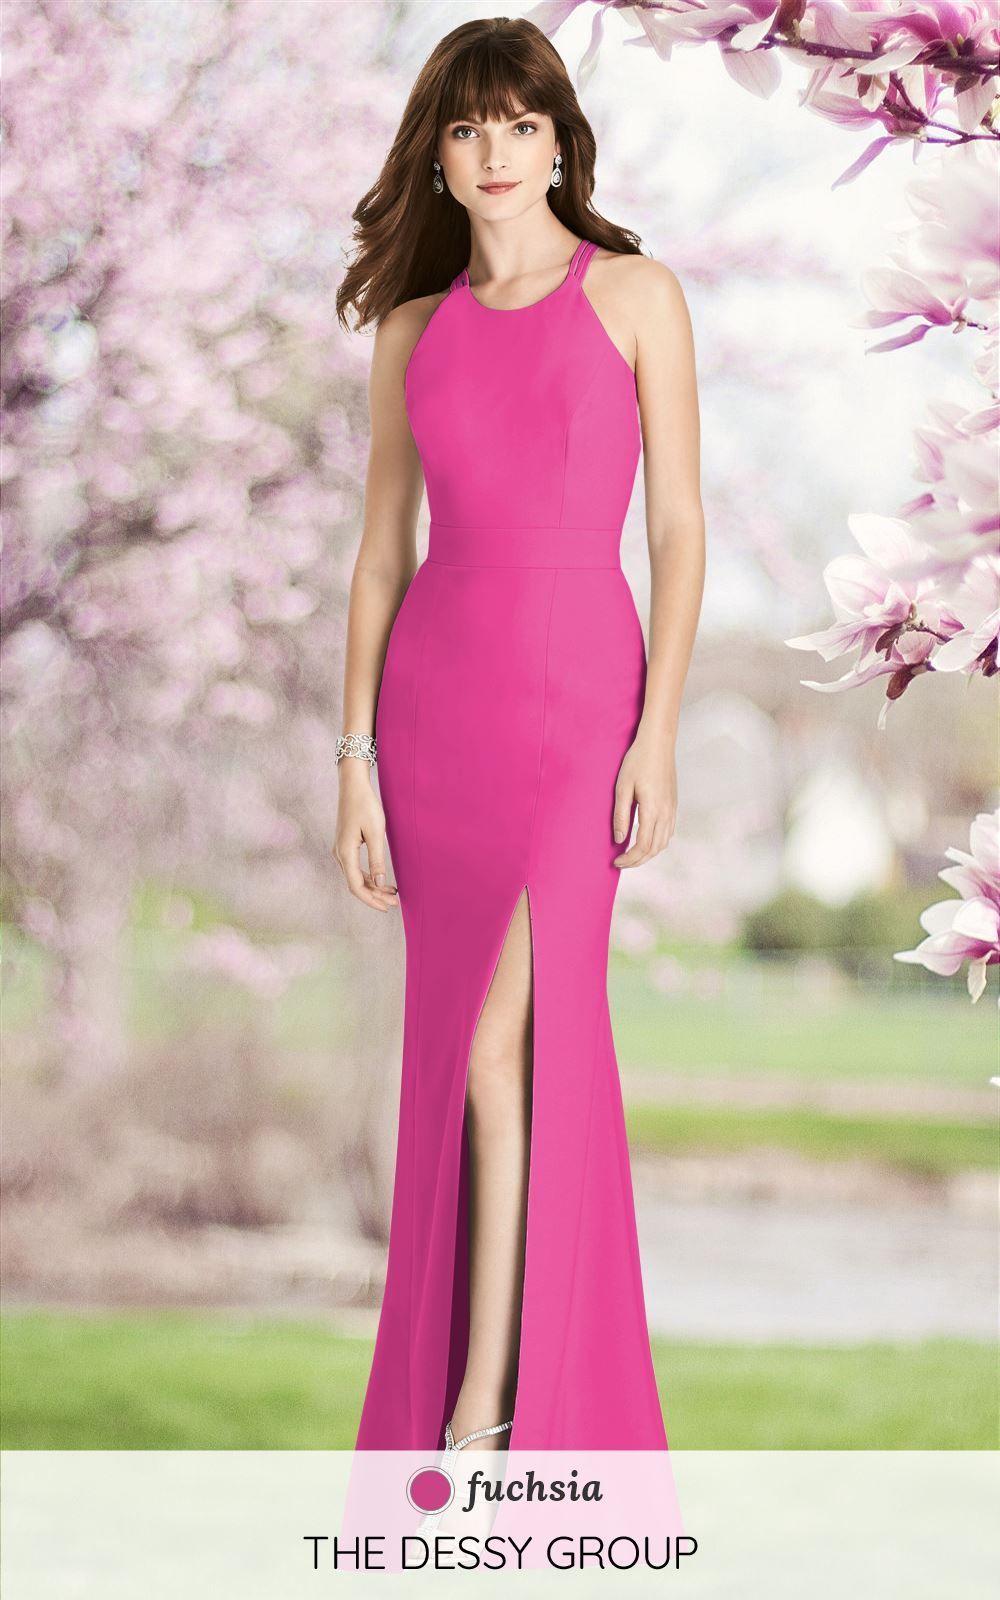 Stunning Fuchsia Pink Bridesmaid Dresses Hot Pink Bridesmaid Dresses Pink Bridesmaid Dresses Fuchsia Bridesmaid Dresses [ 1600 x 1000 Pixel ]